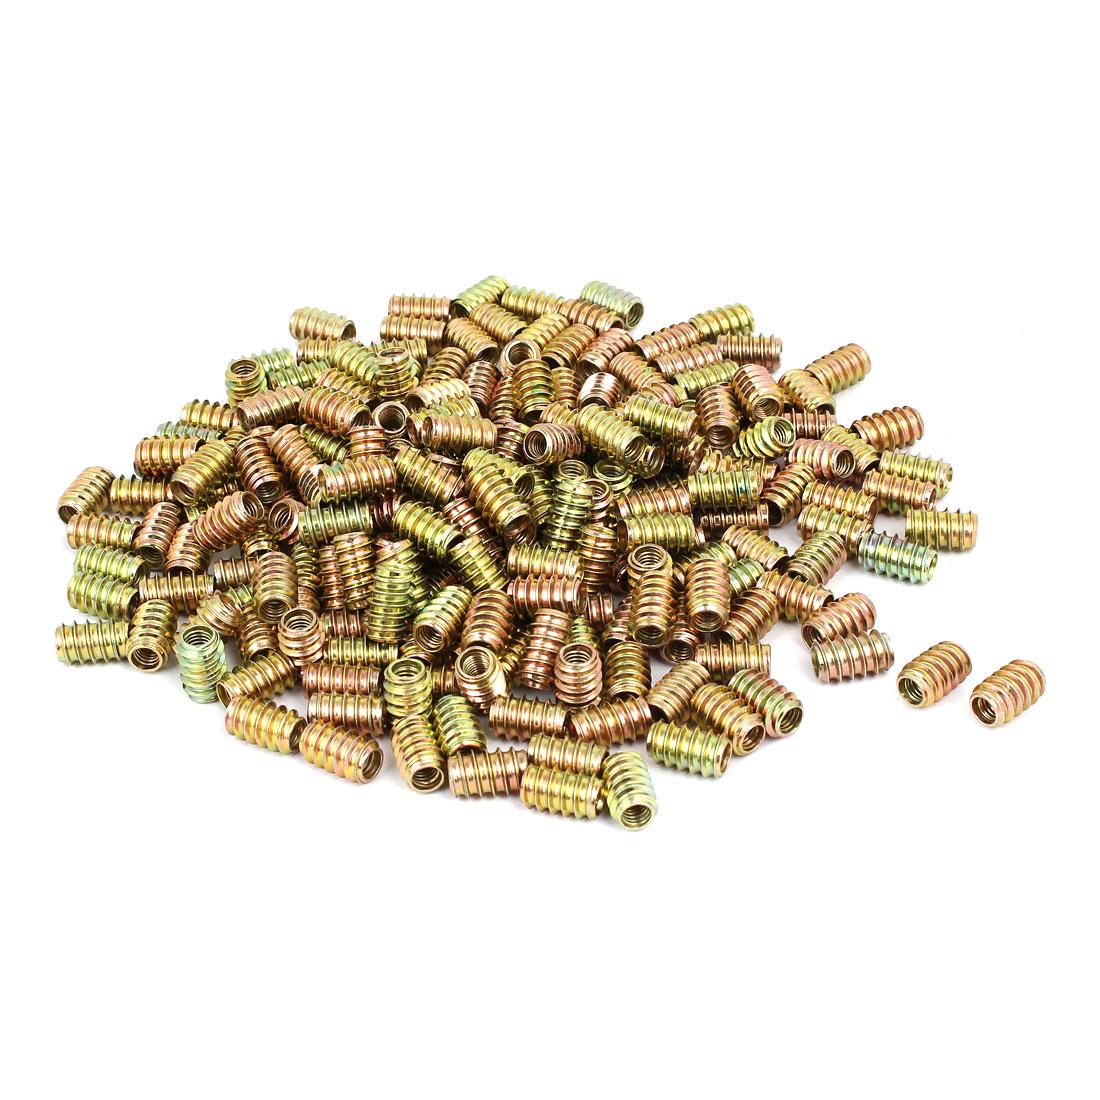 M6x17mm Carbon Steel Yellow Zinc Plated Furniture Threaded Insert Nut 400pcs